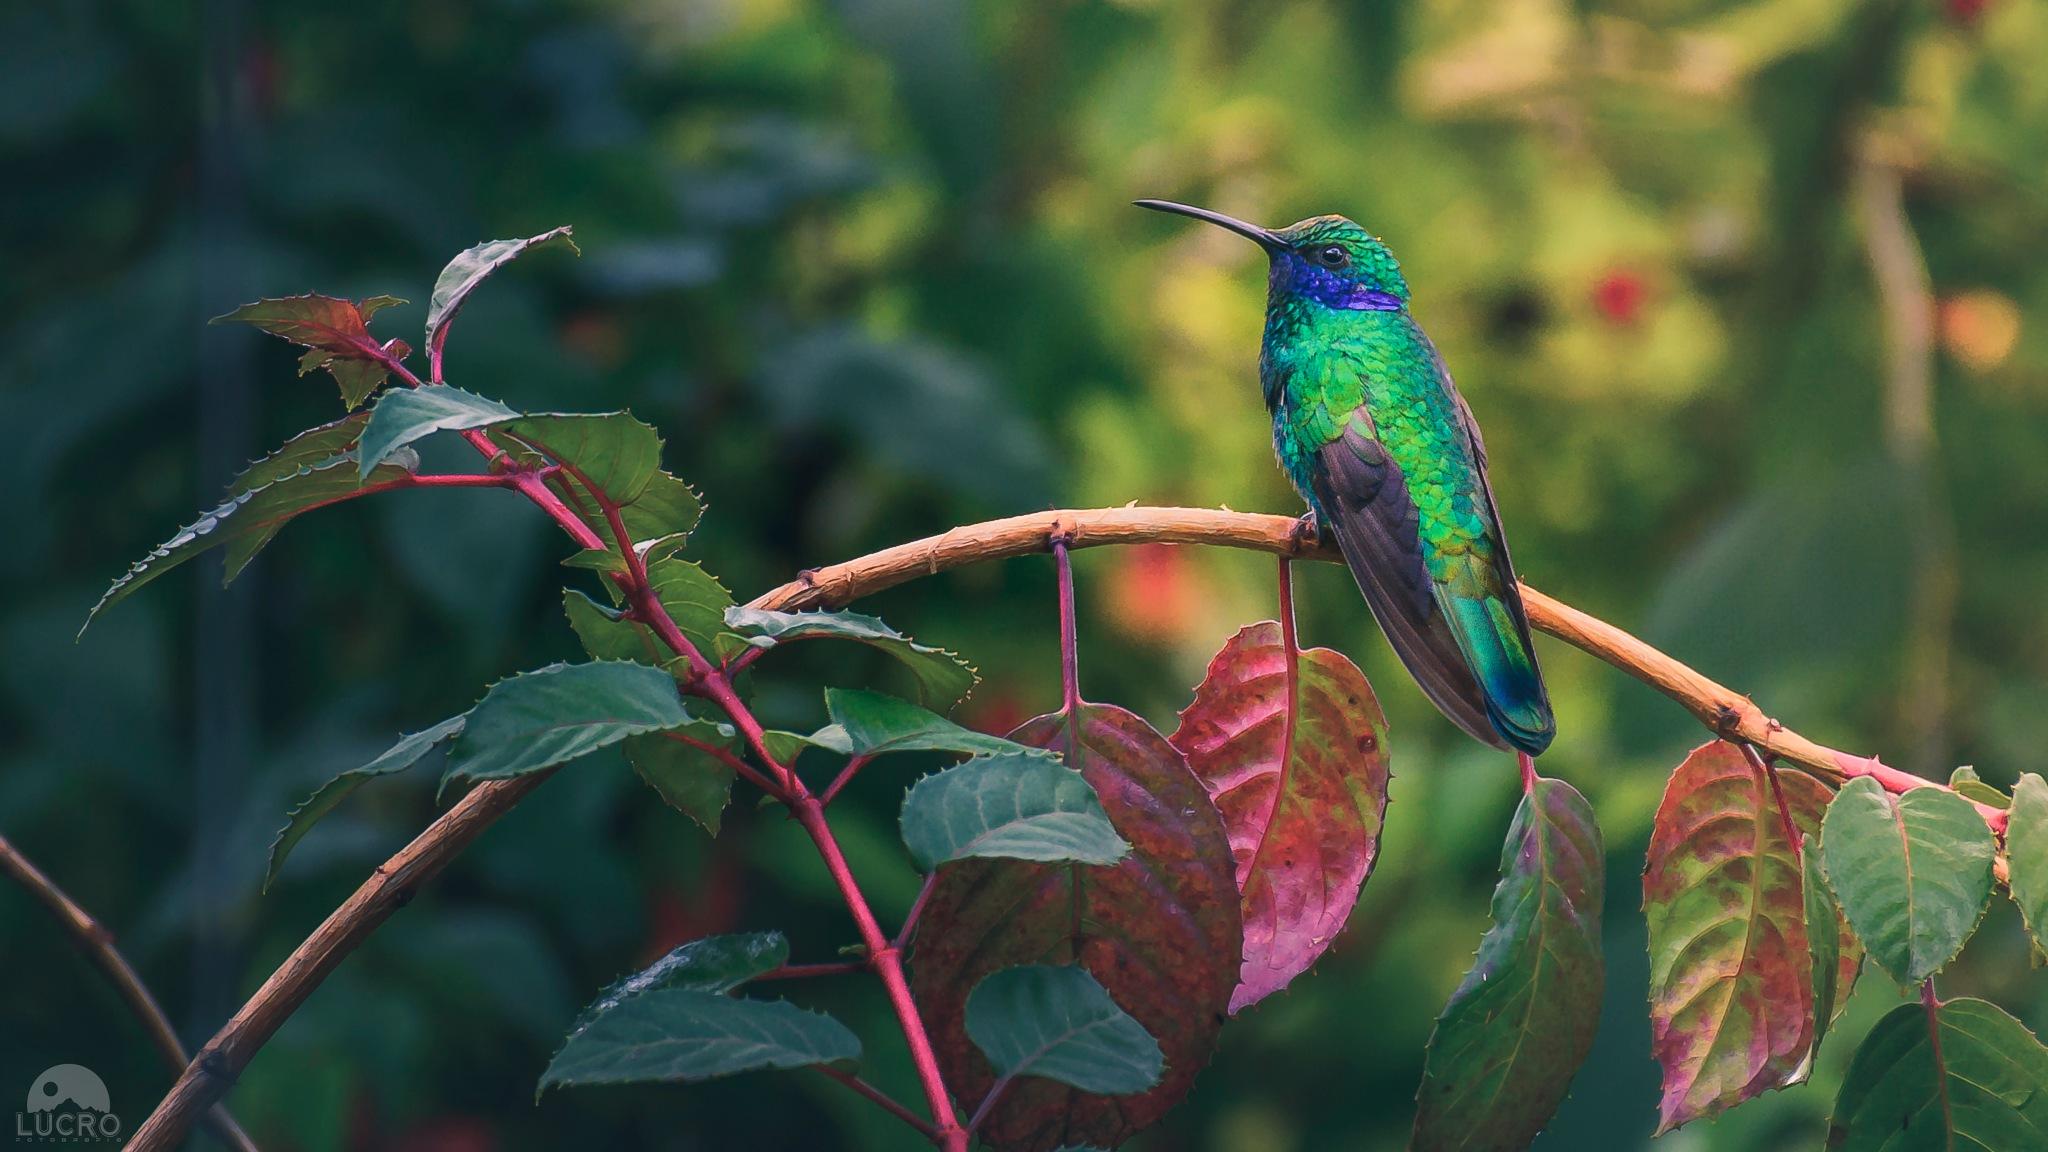 Hummingbird by LucroFotografia